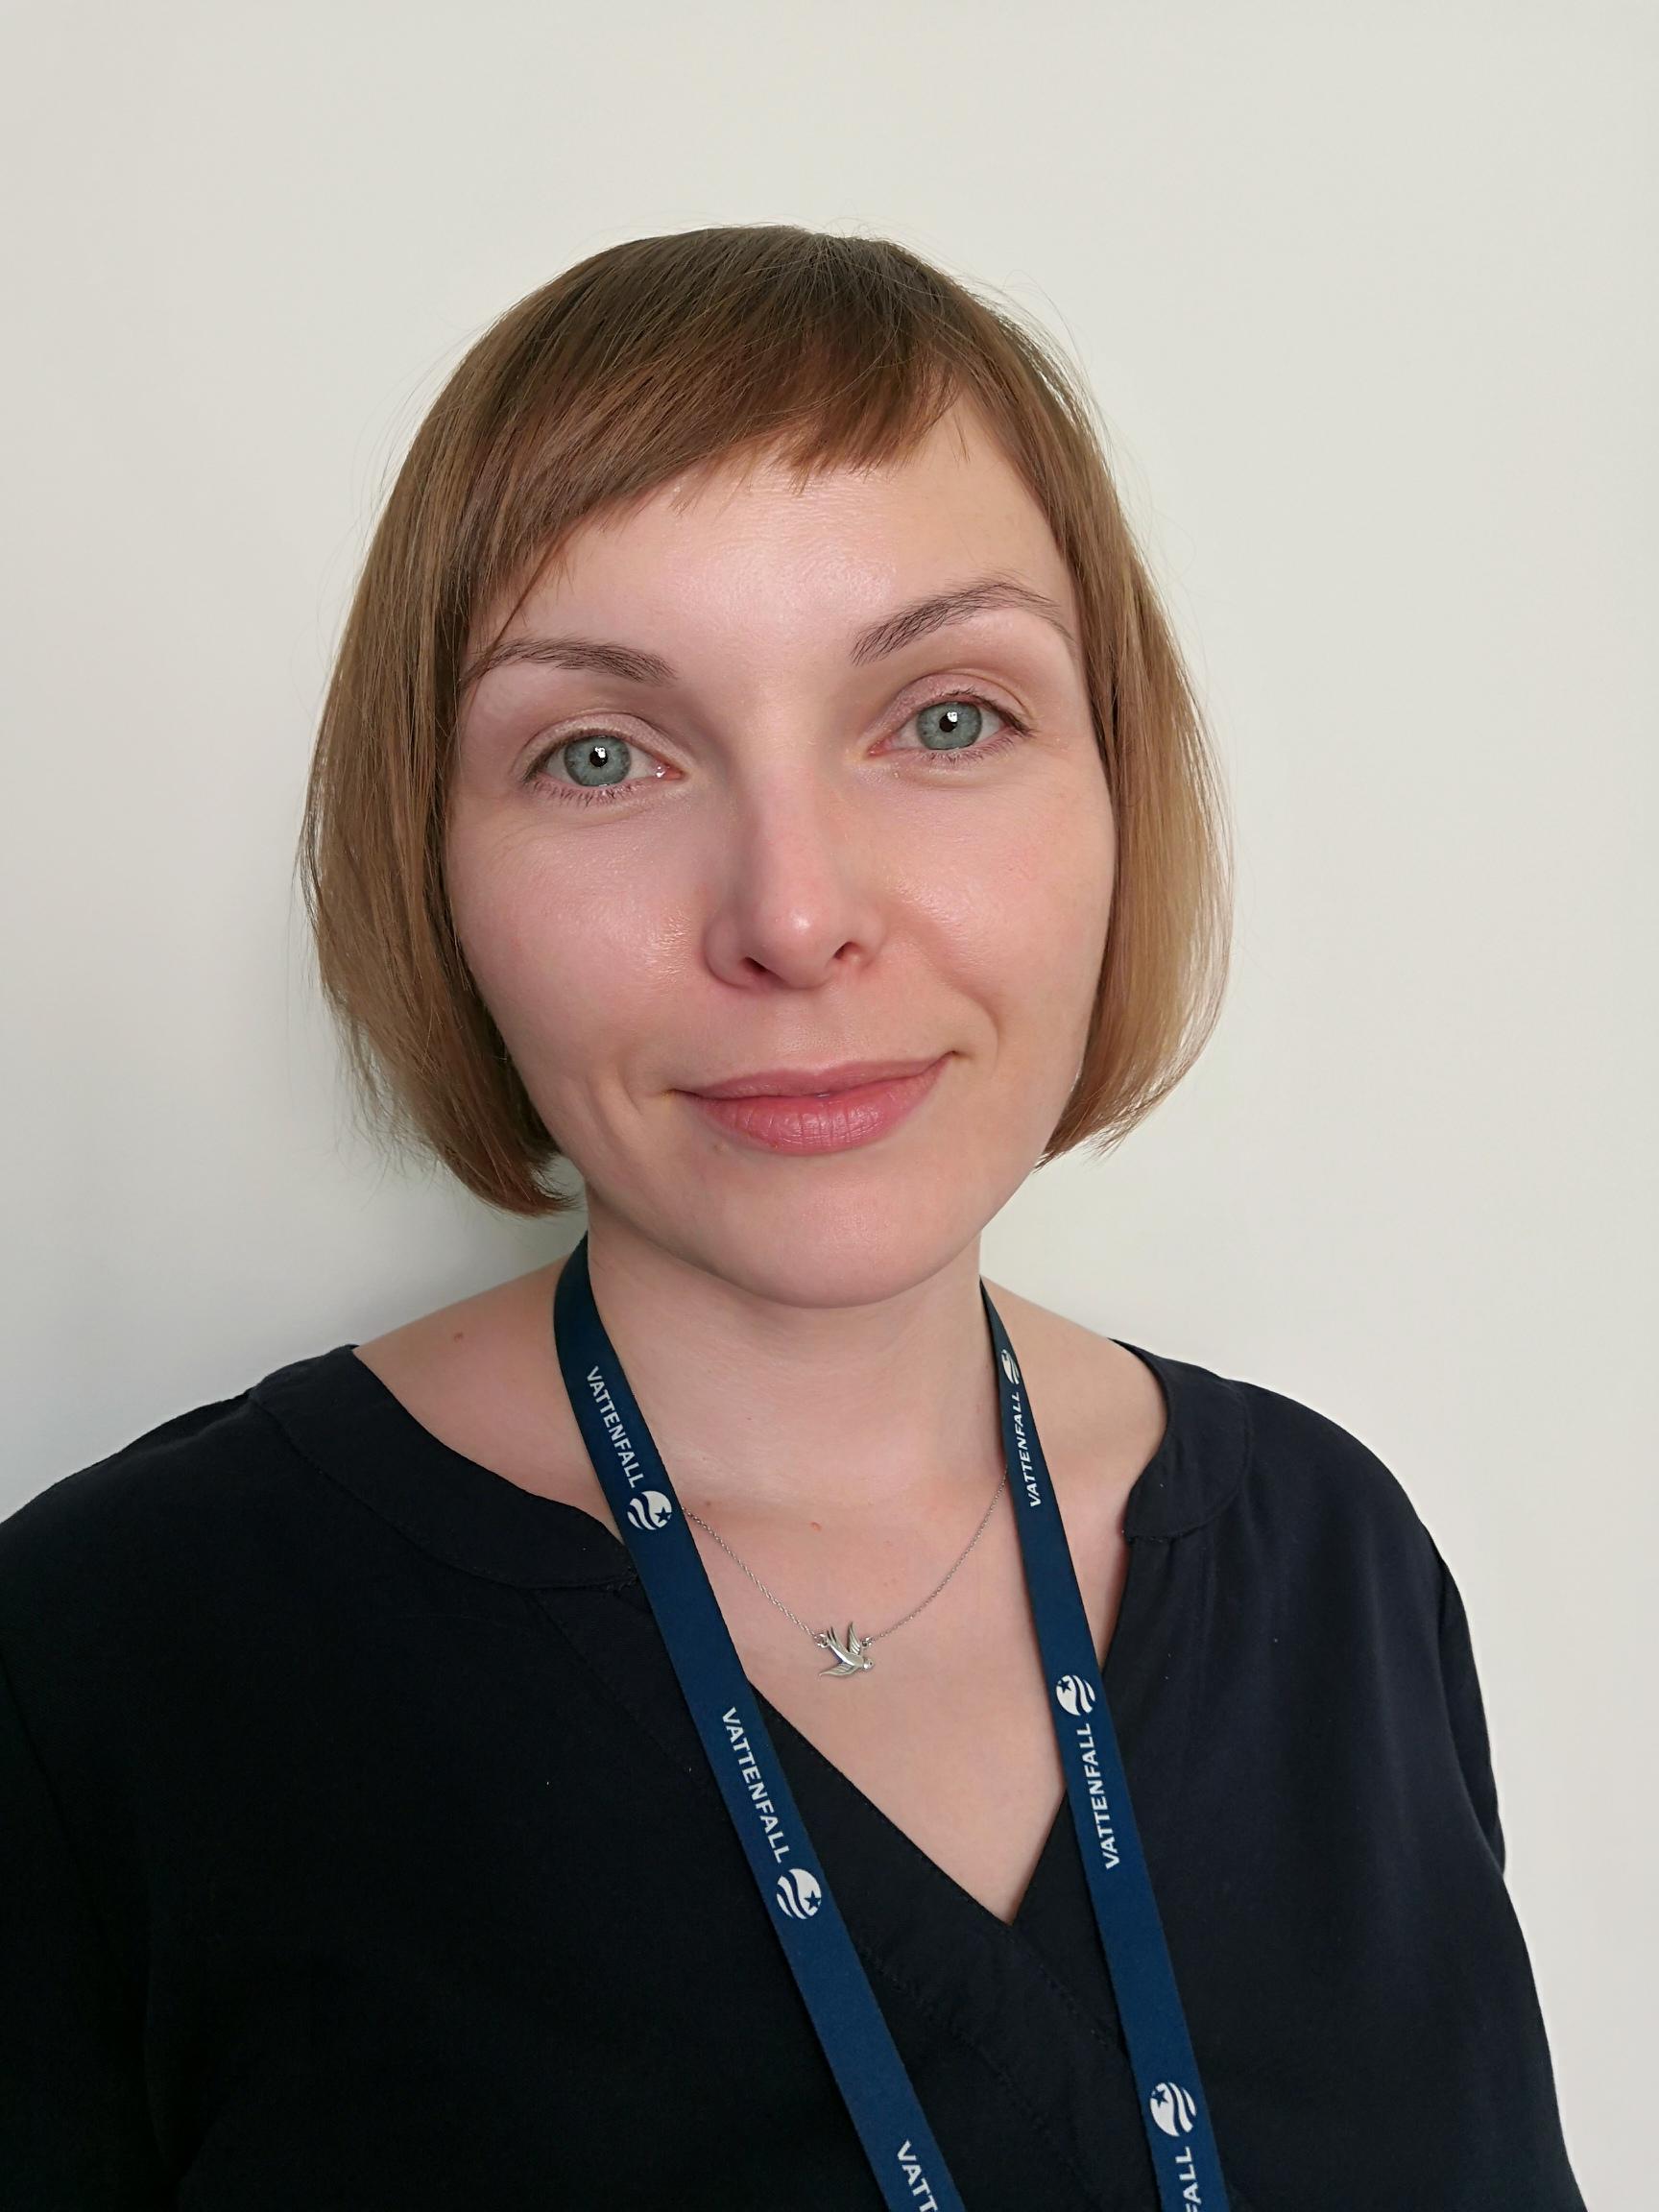 Anna Żołnowska